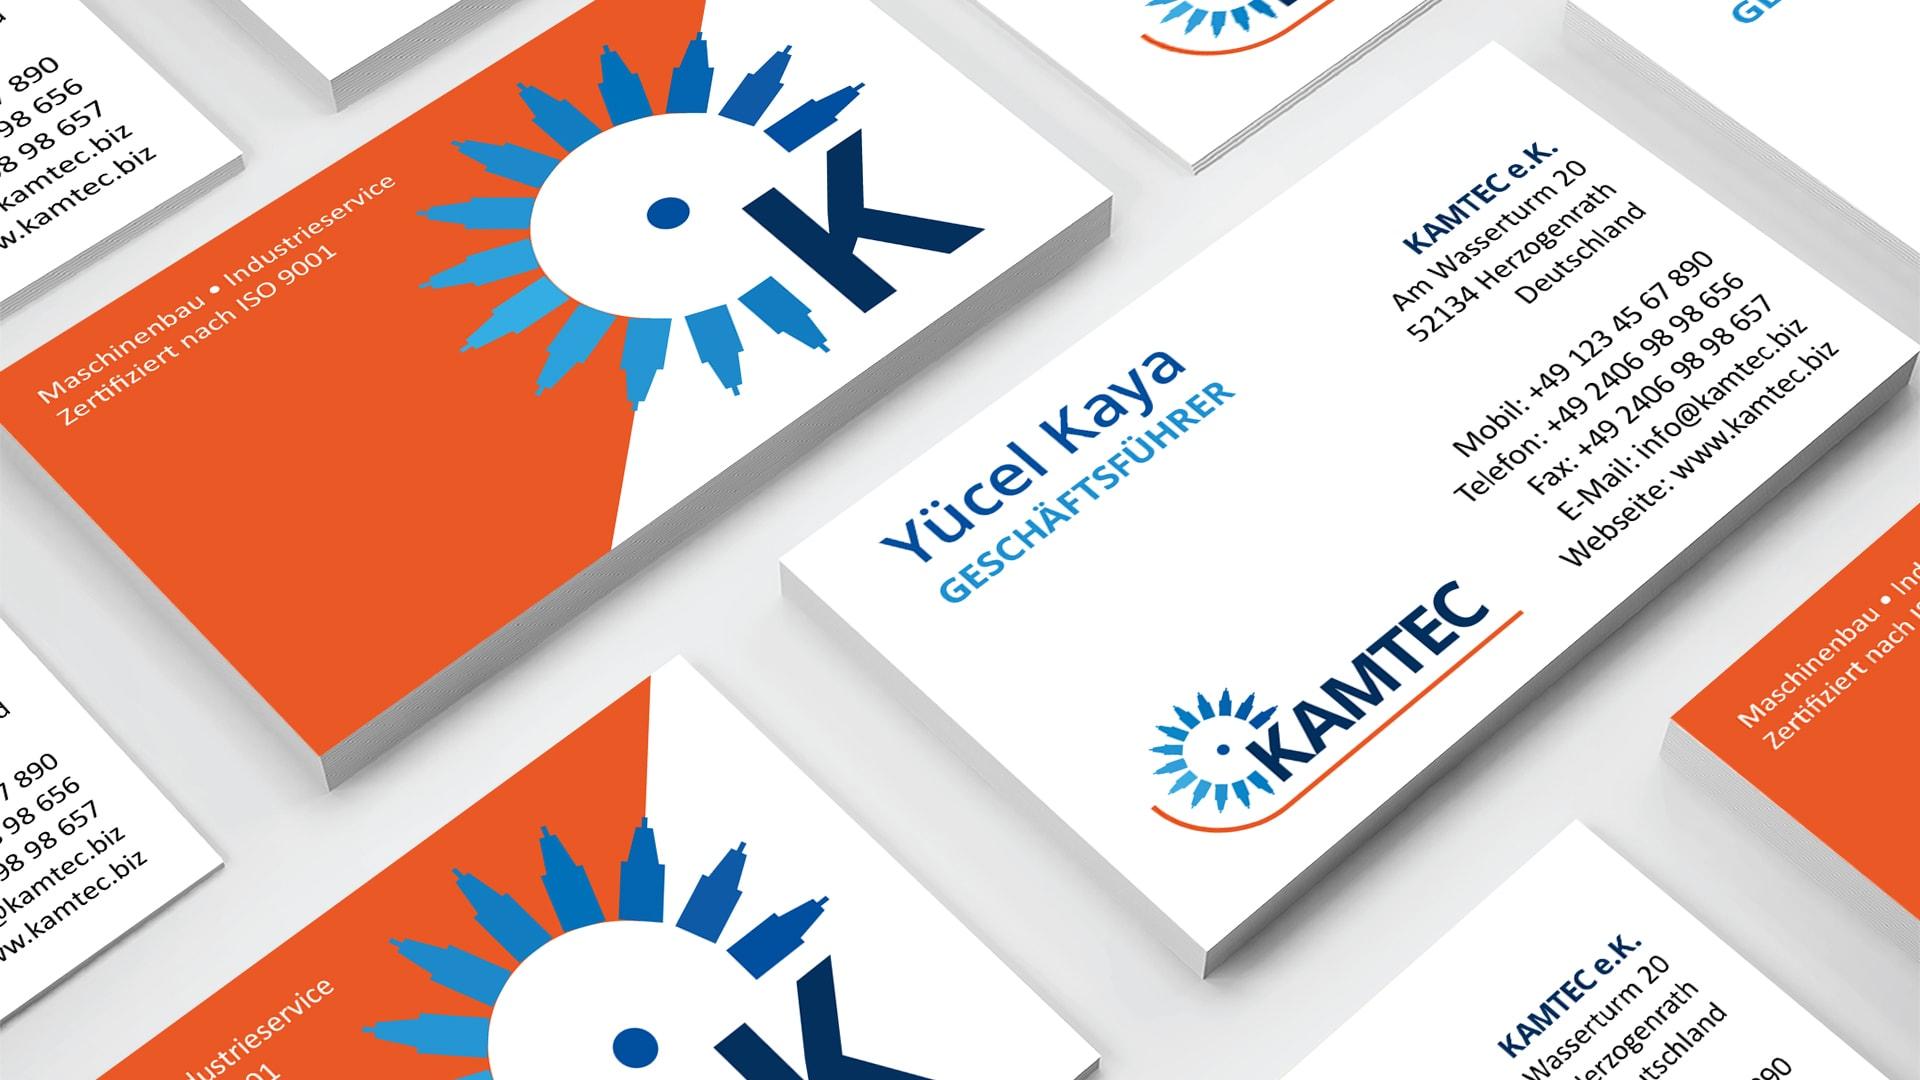 Visitenkarten KAMTEC e.K. – Maschinenbau und Industrieservice, Elementardesign